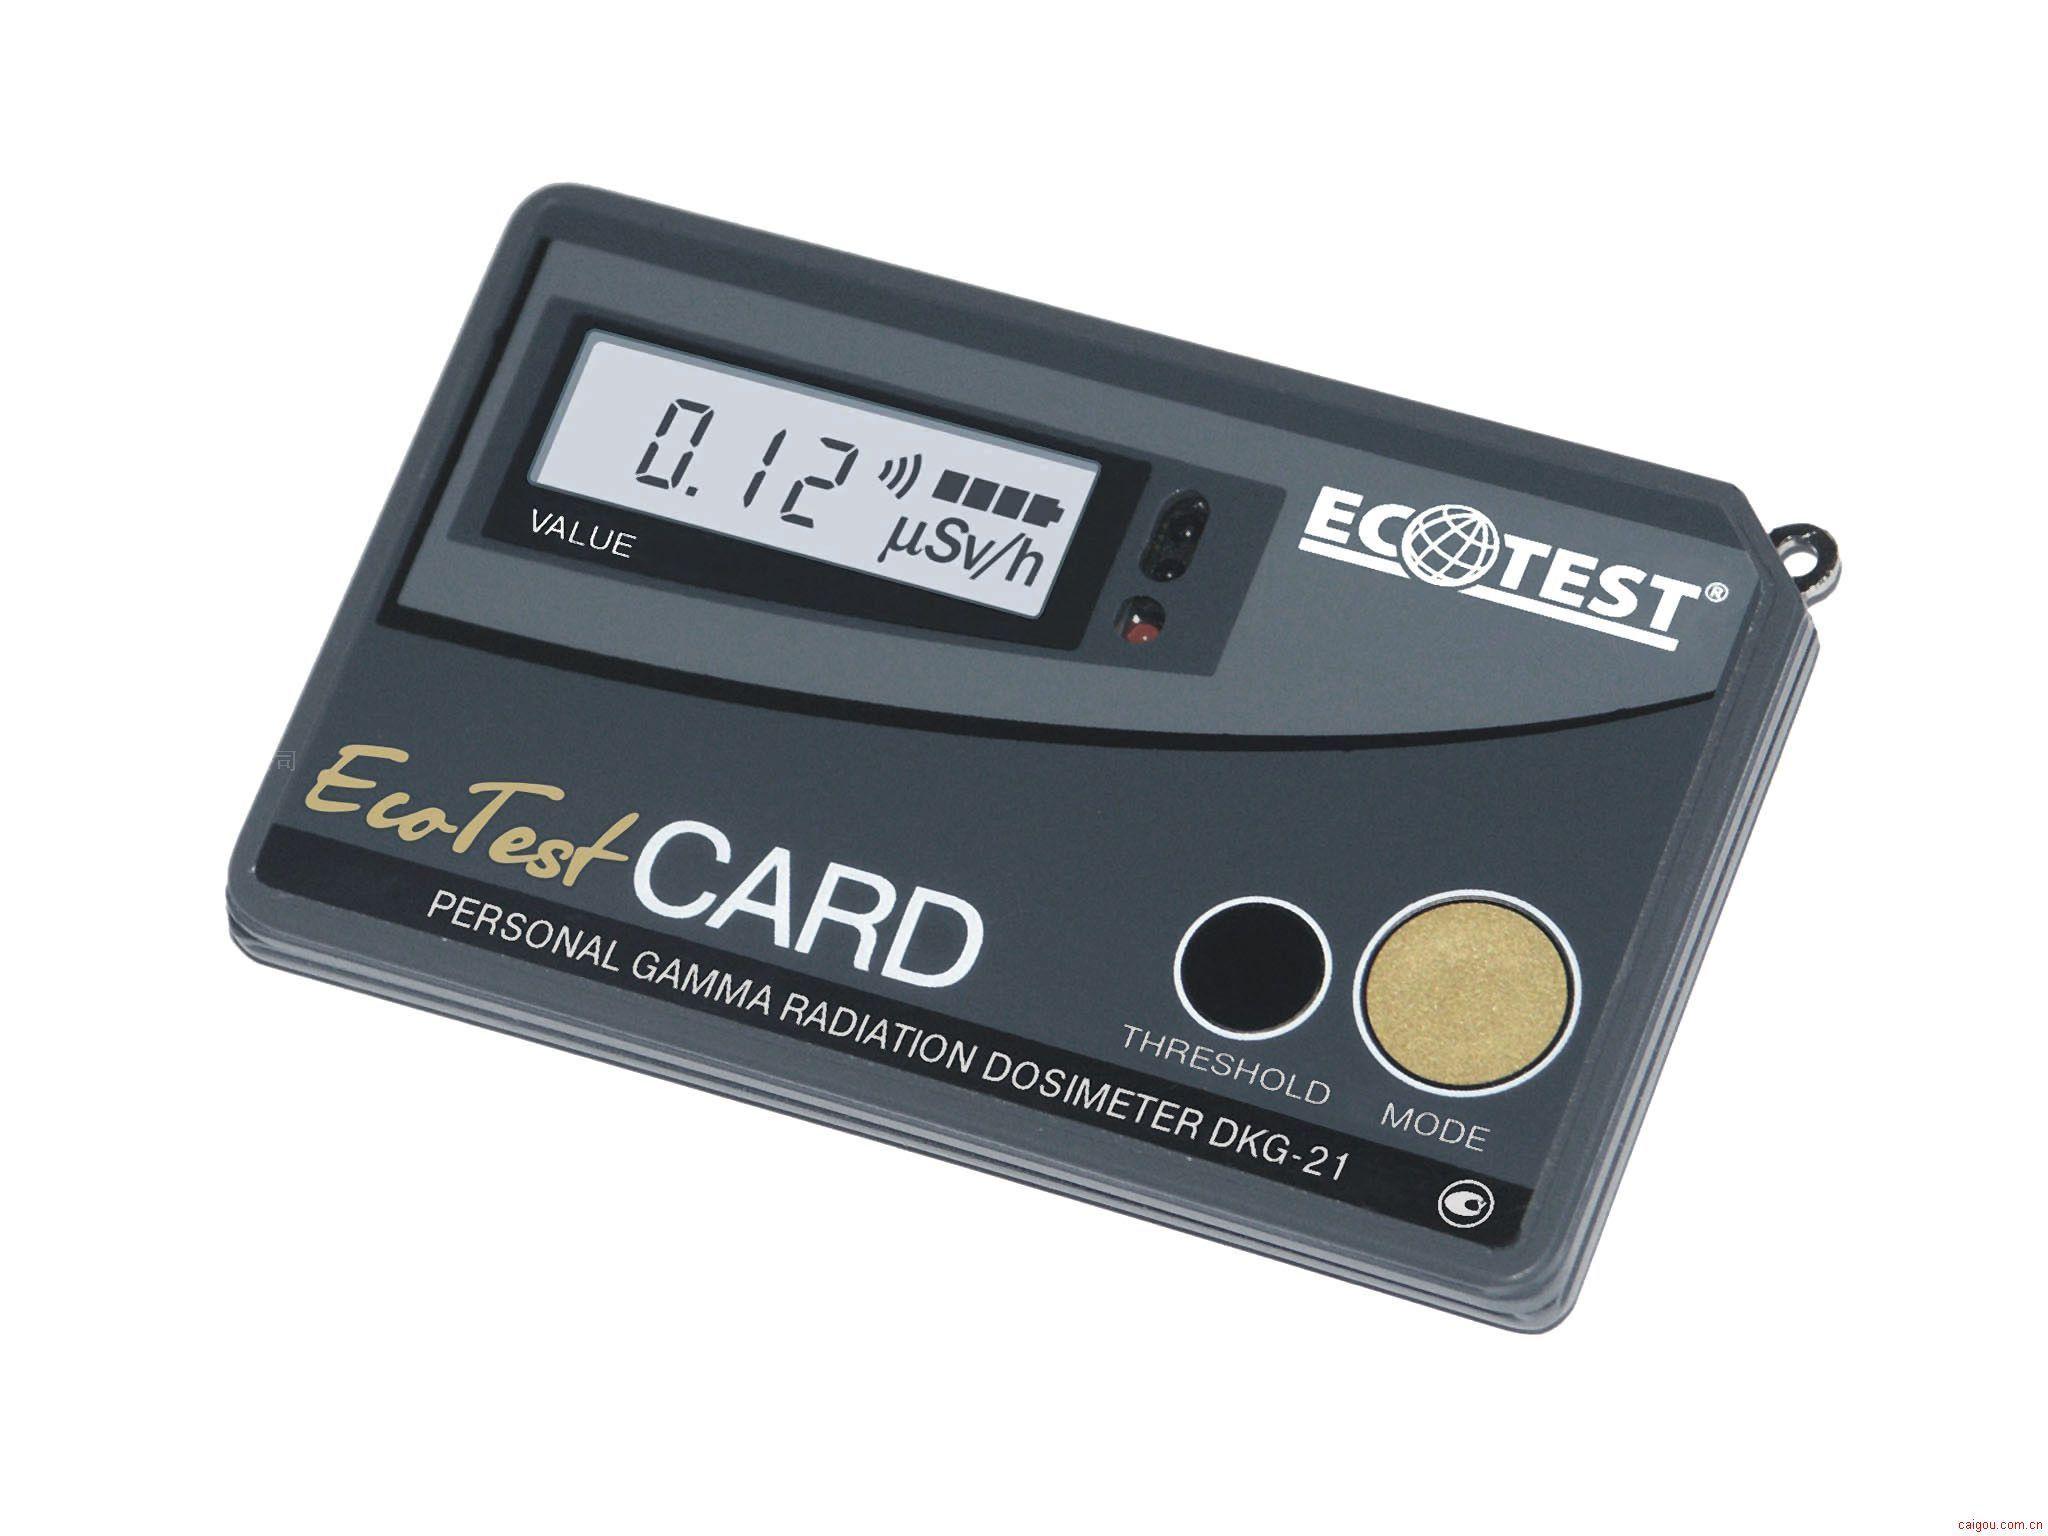 Ecotest CARD(DKG-21)卡片式个人剂量报警仪